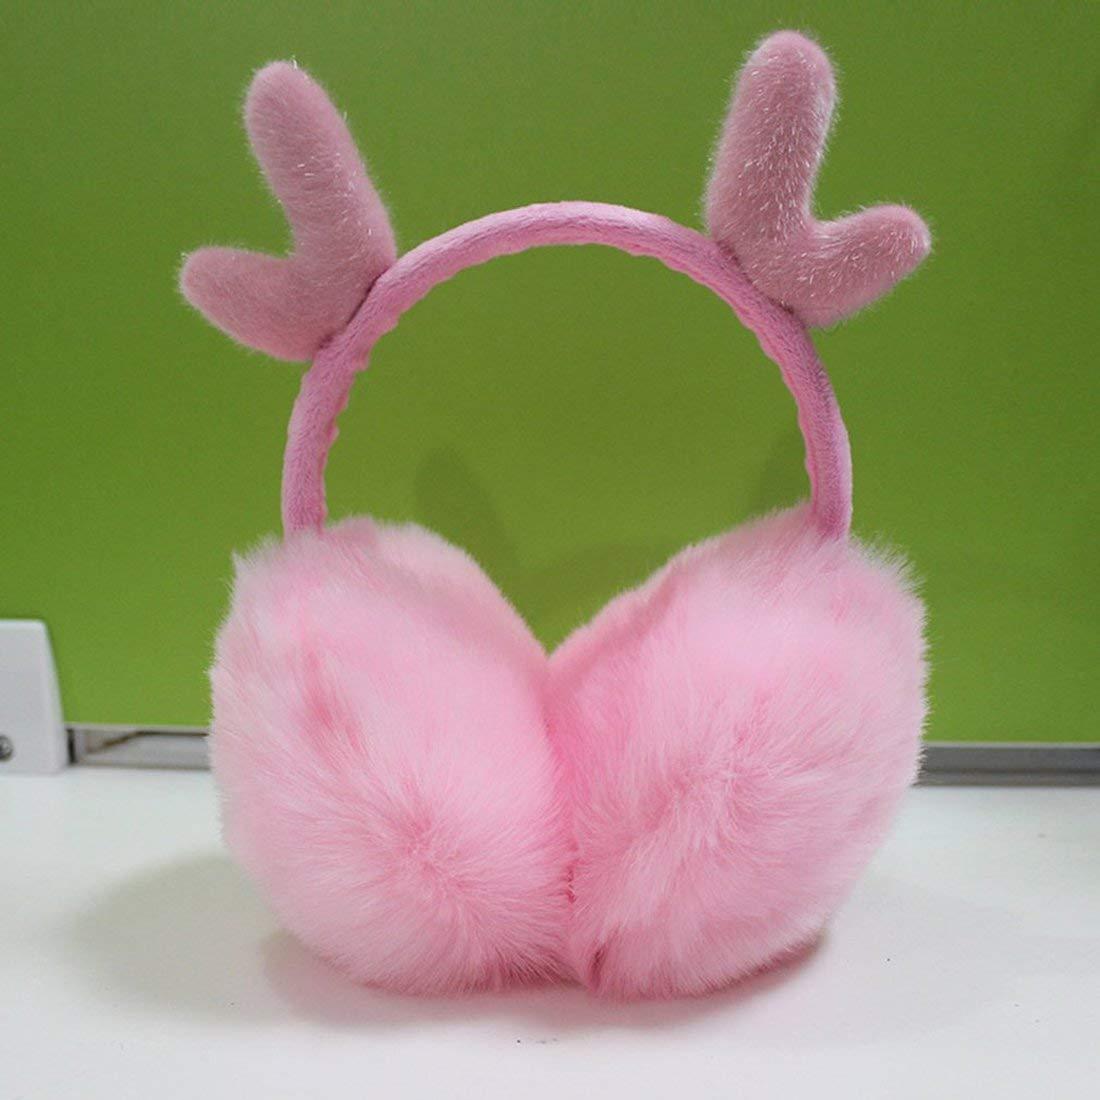 Super Soft Plush Earmuff With Deer Horn Shape Decor Lovely Cute Cartoon Earmuff Outdoor Protective Ear Cover - Pink Formulaone